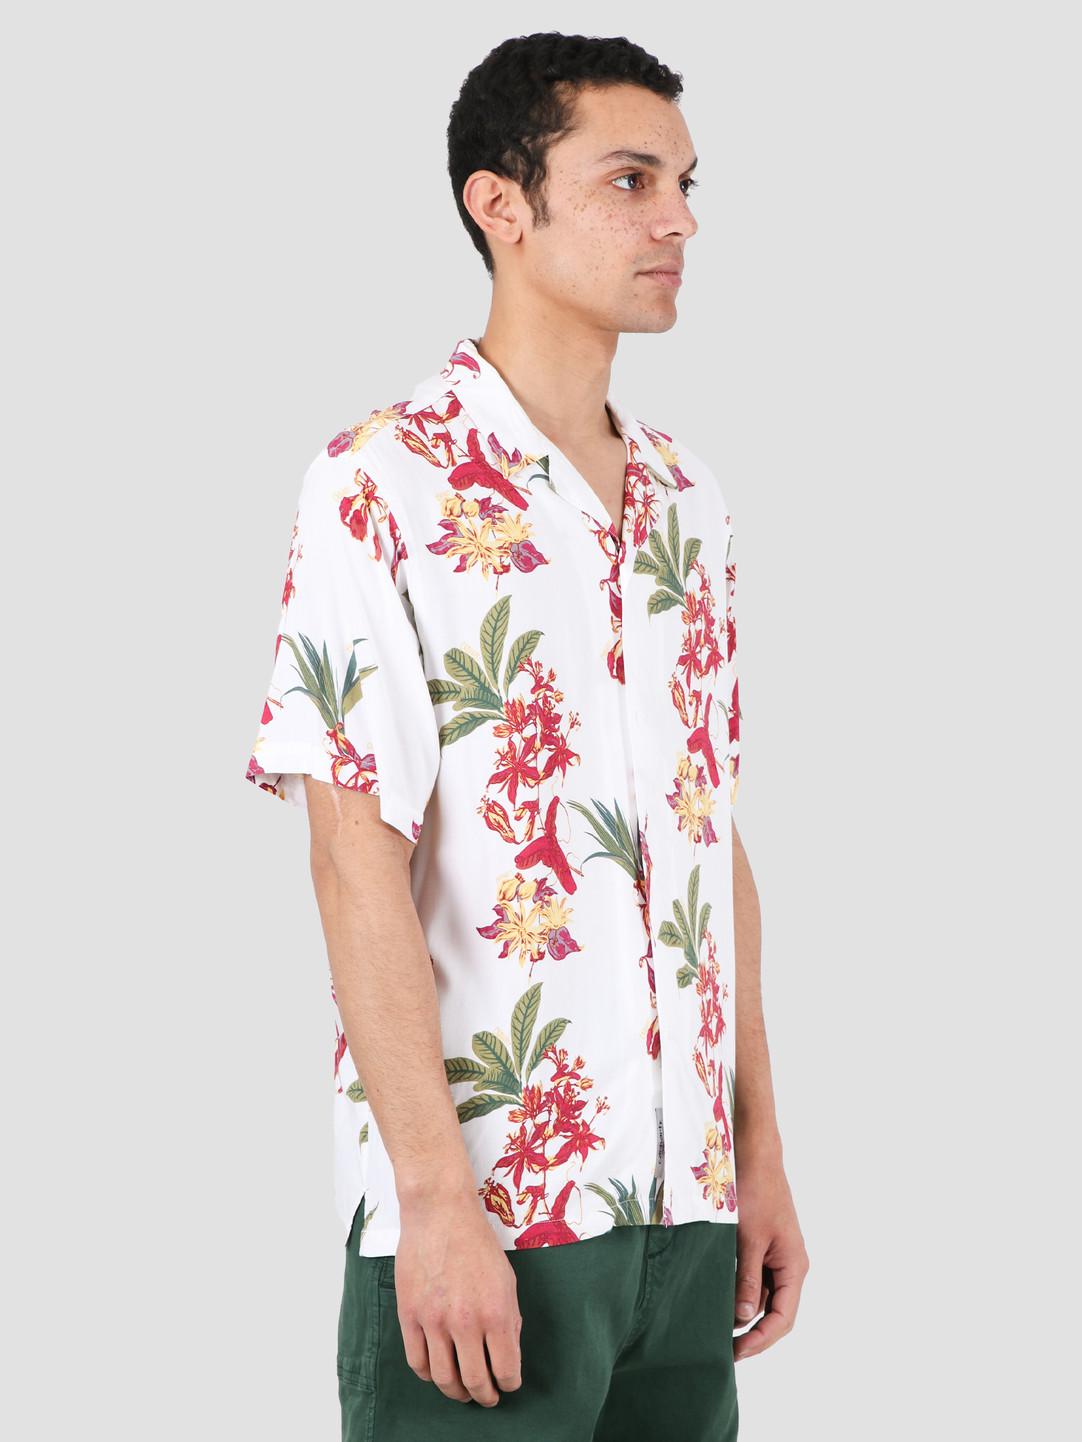 Carhartt WIP Carhartt WIP Hawaiian Floral Short Sleeve Shirt Hawaiian Floral Print White I027531-09K00